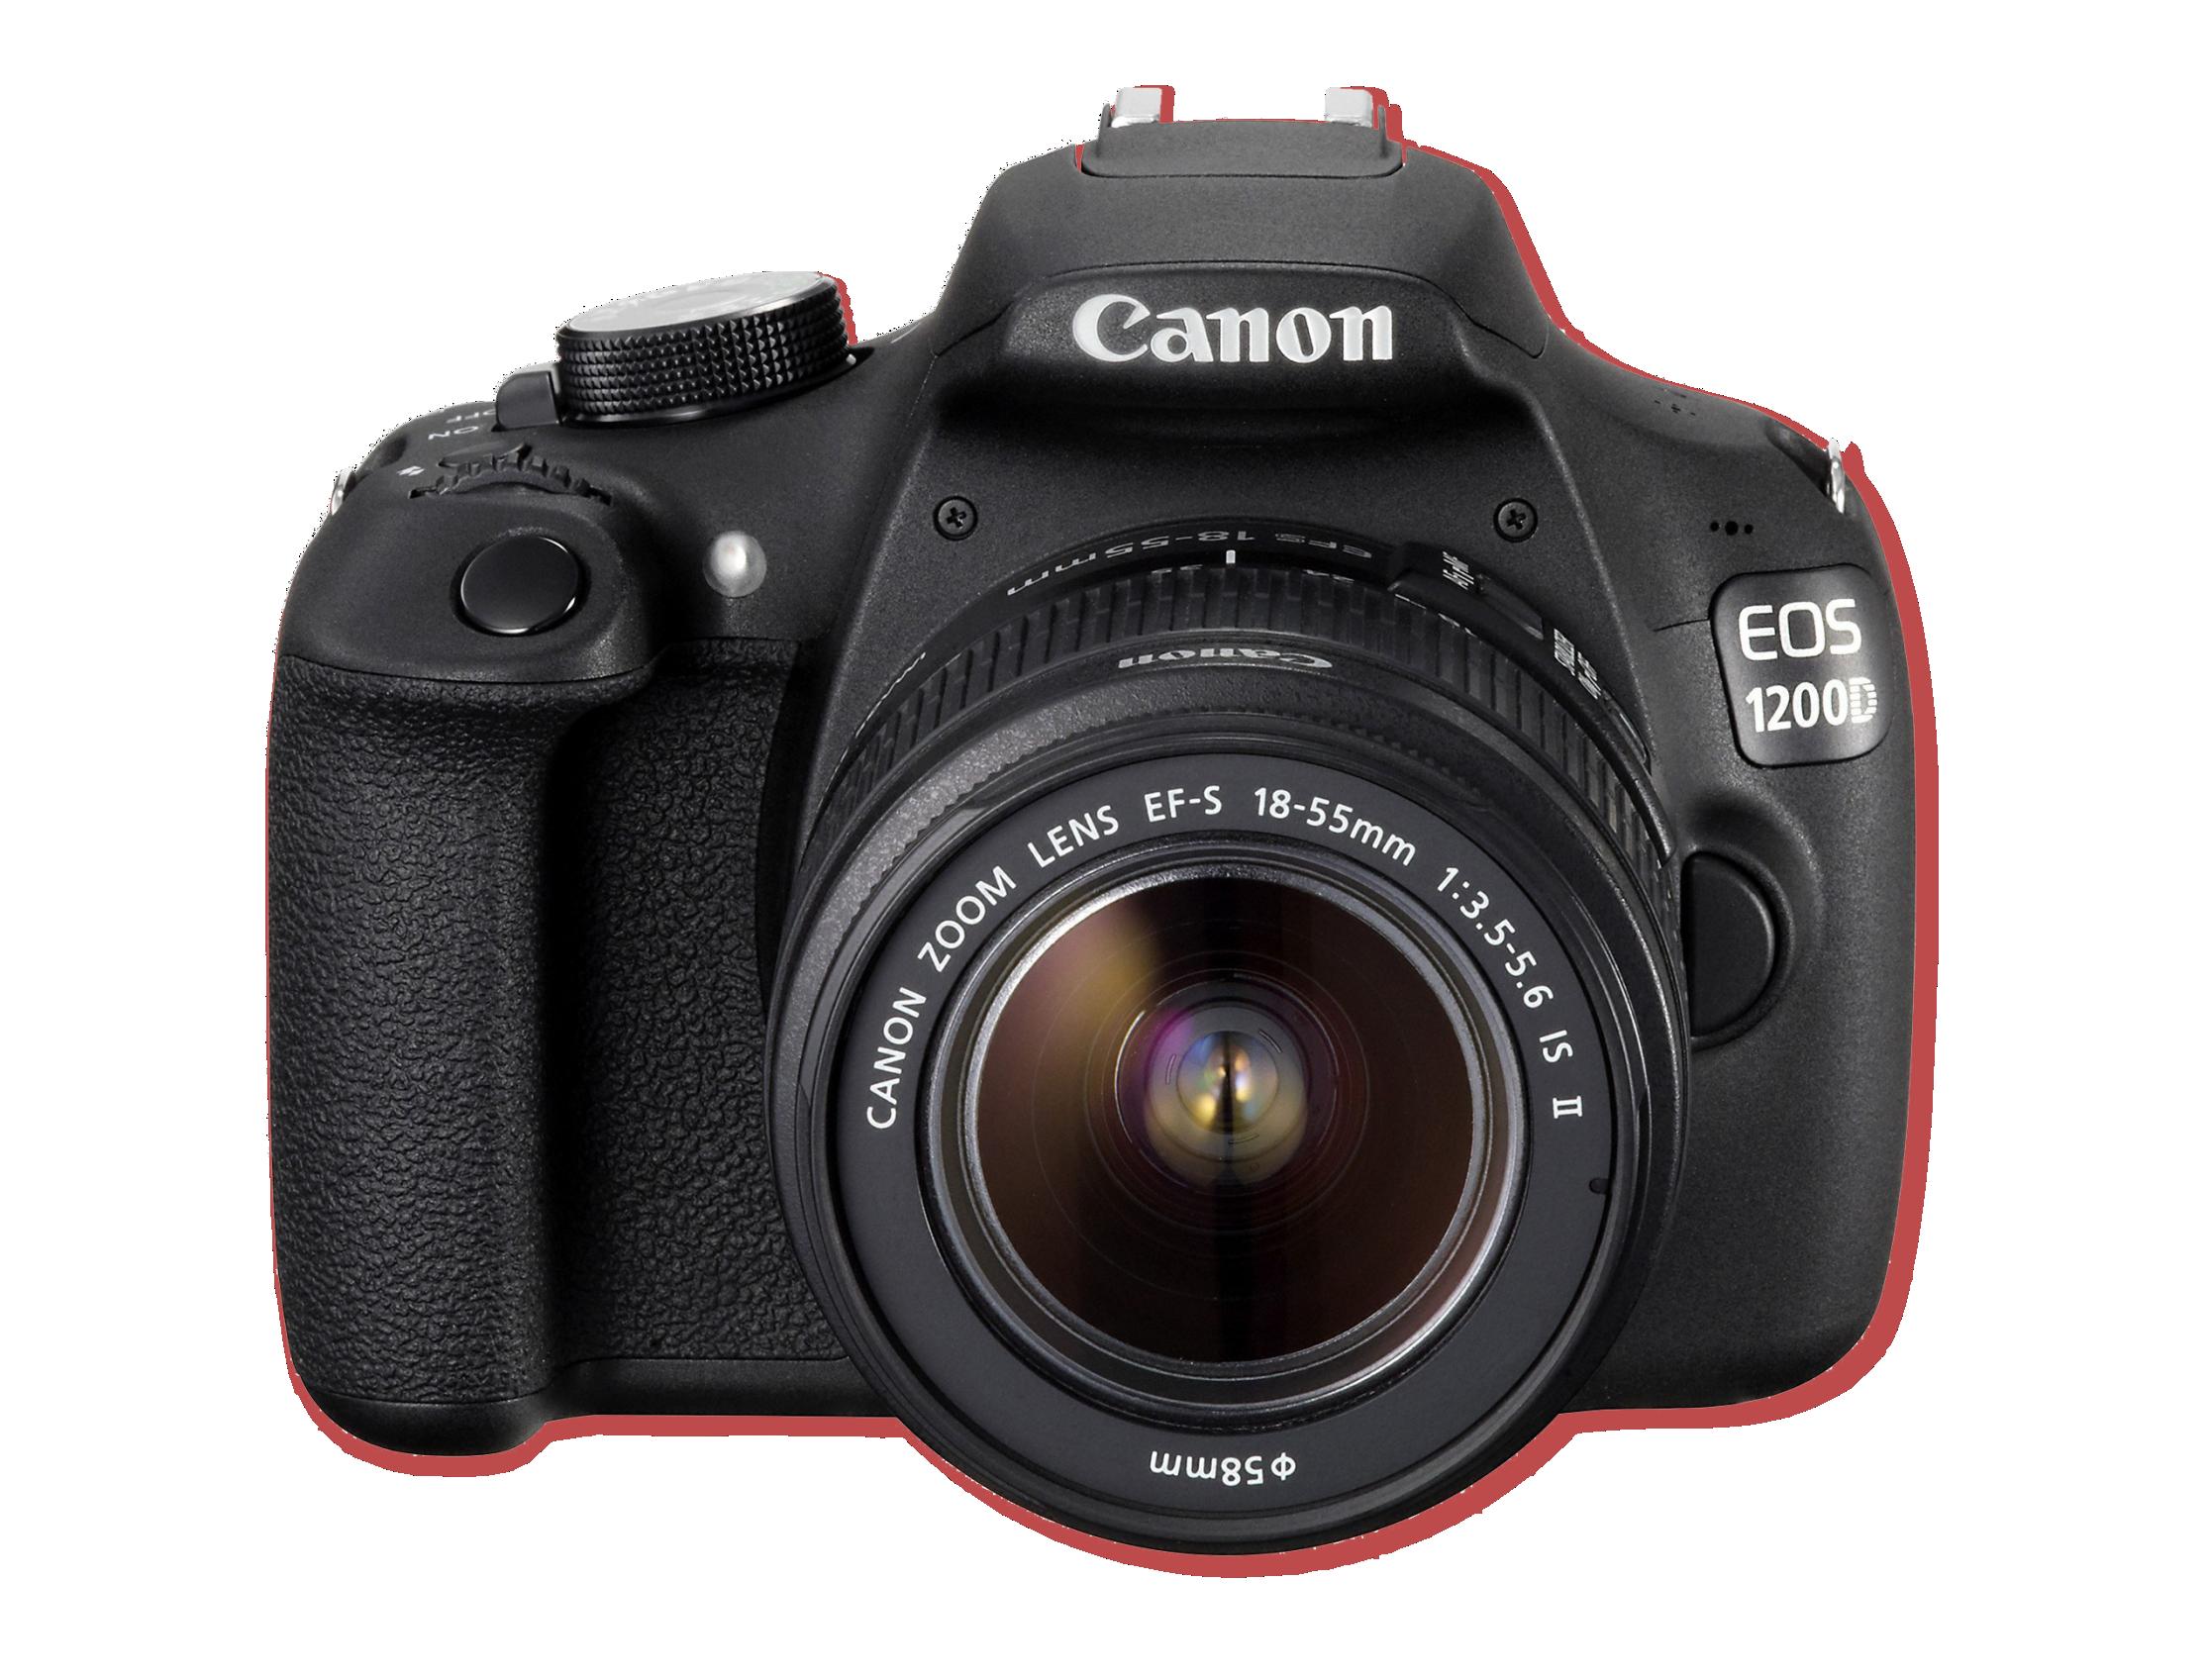 Sewa kamera Canon Eos 1200d 1